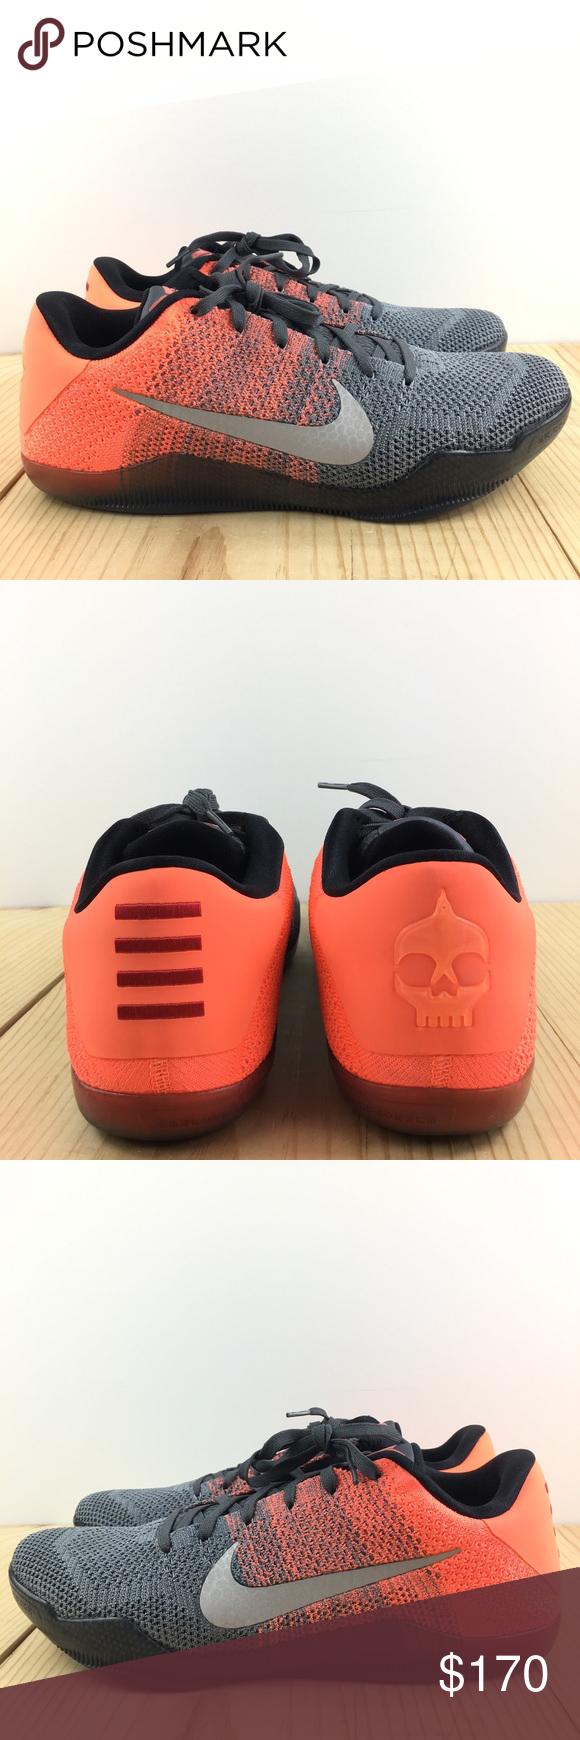 975a9e442a79 Nike Kobe XI Elite Low Easter Size 10 Brand New without Box Nike Kobe XI  Elite Low Easter Size 10 Mens Basketball Shoes Bright Mango Nike Shoes  Athletic ...